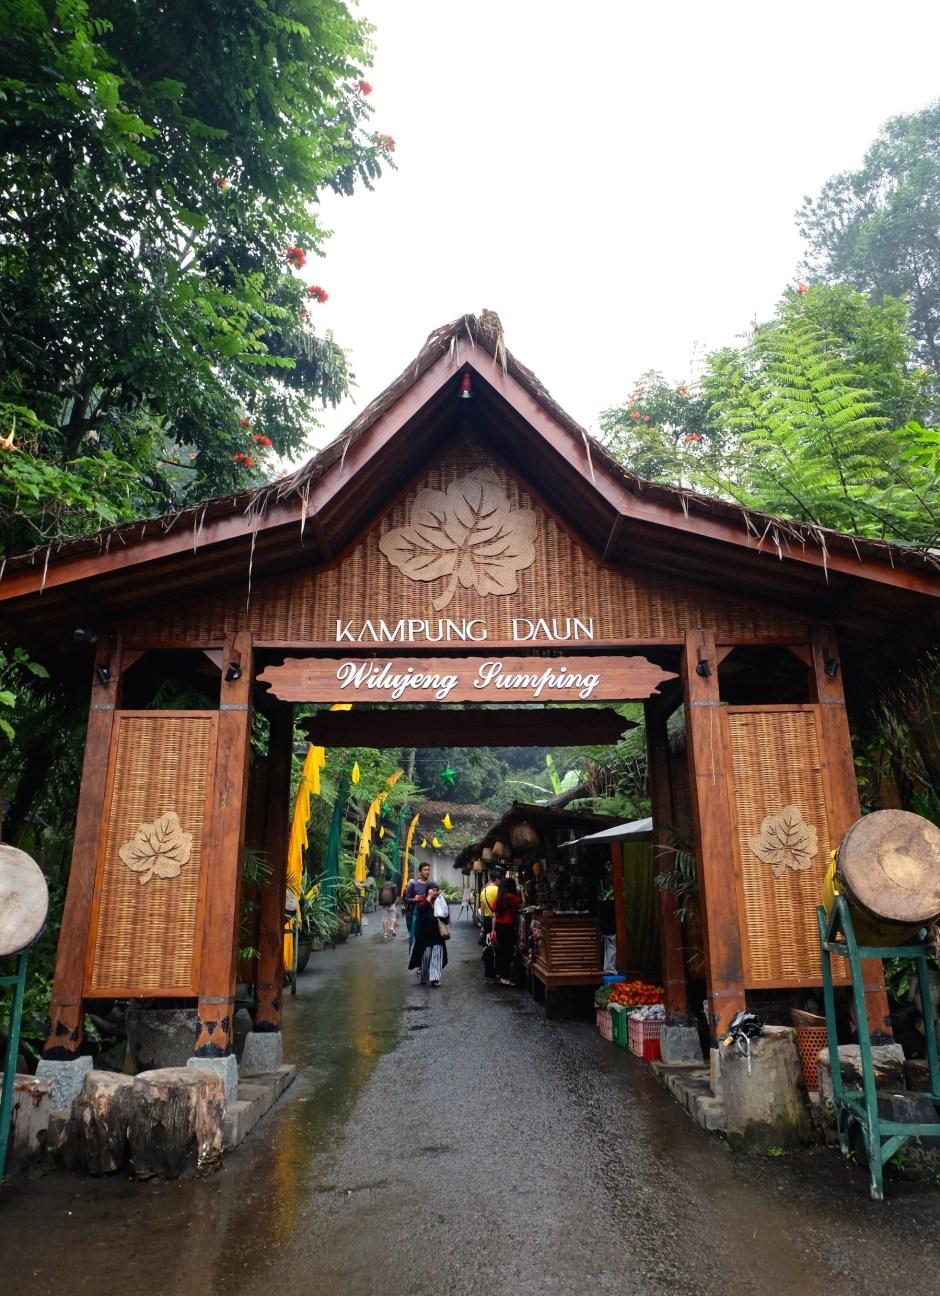 Kampung Daun Entrance